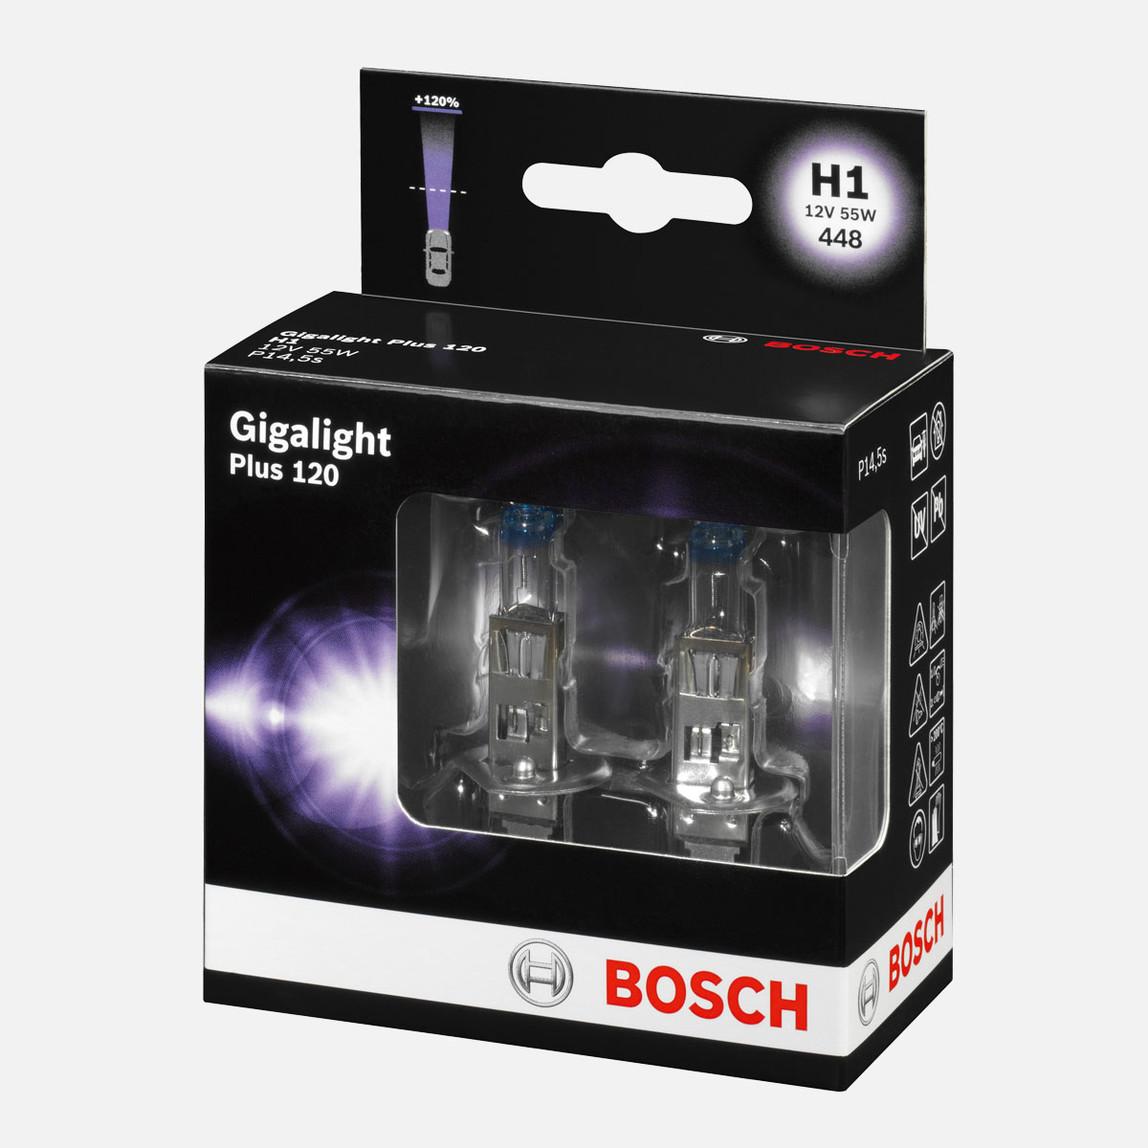 Bosch Oto Ampul 12VH1 Gigalight Plus 120